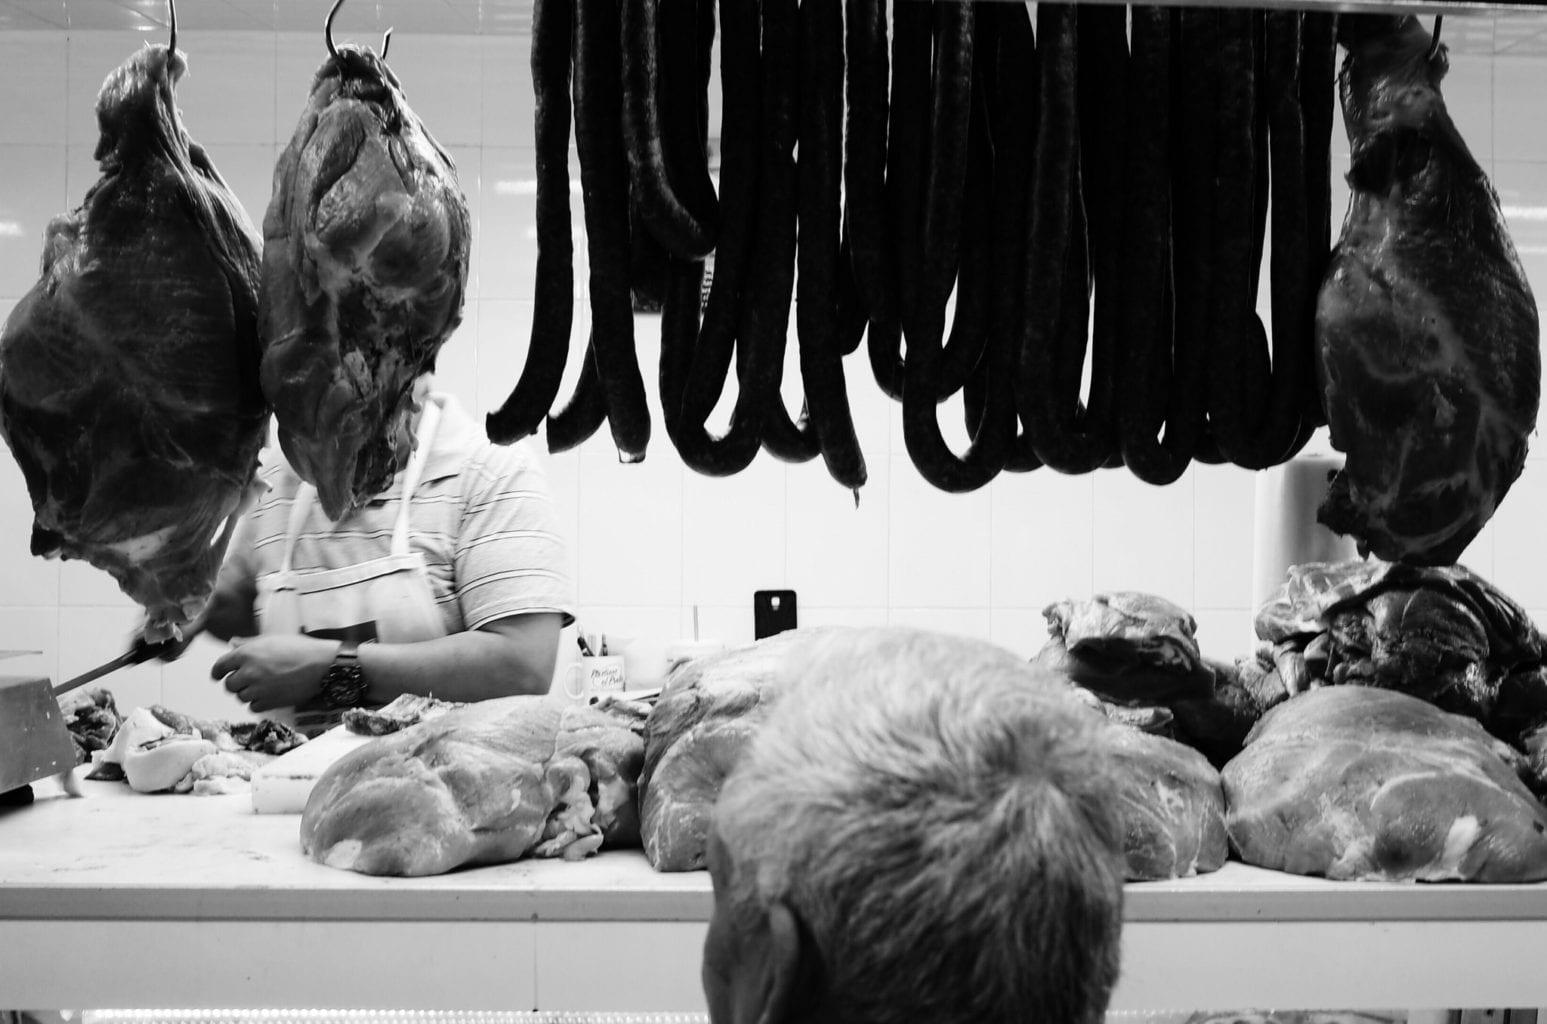 Mondaine black and white photograph